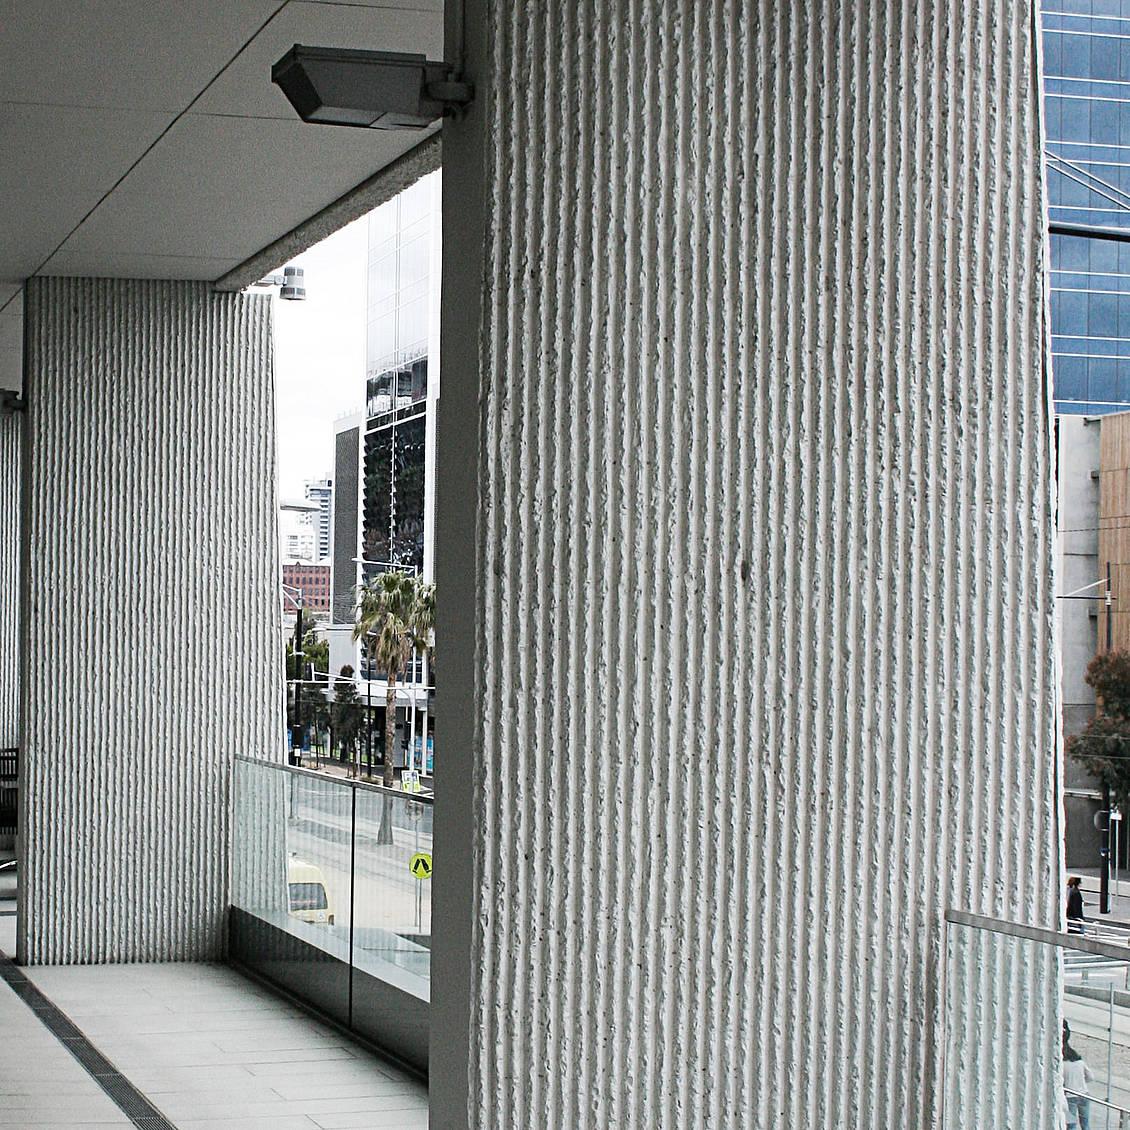 Reckli 1 316 B Pennsilva Reckli Design Your Concrete